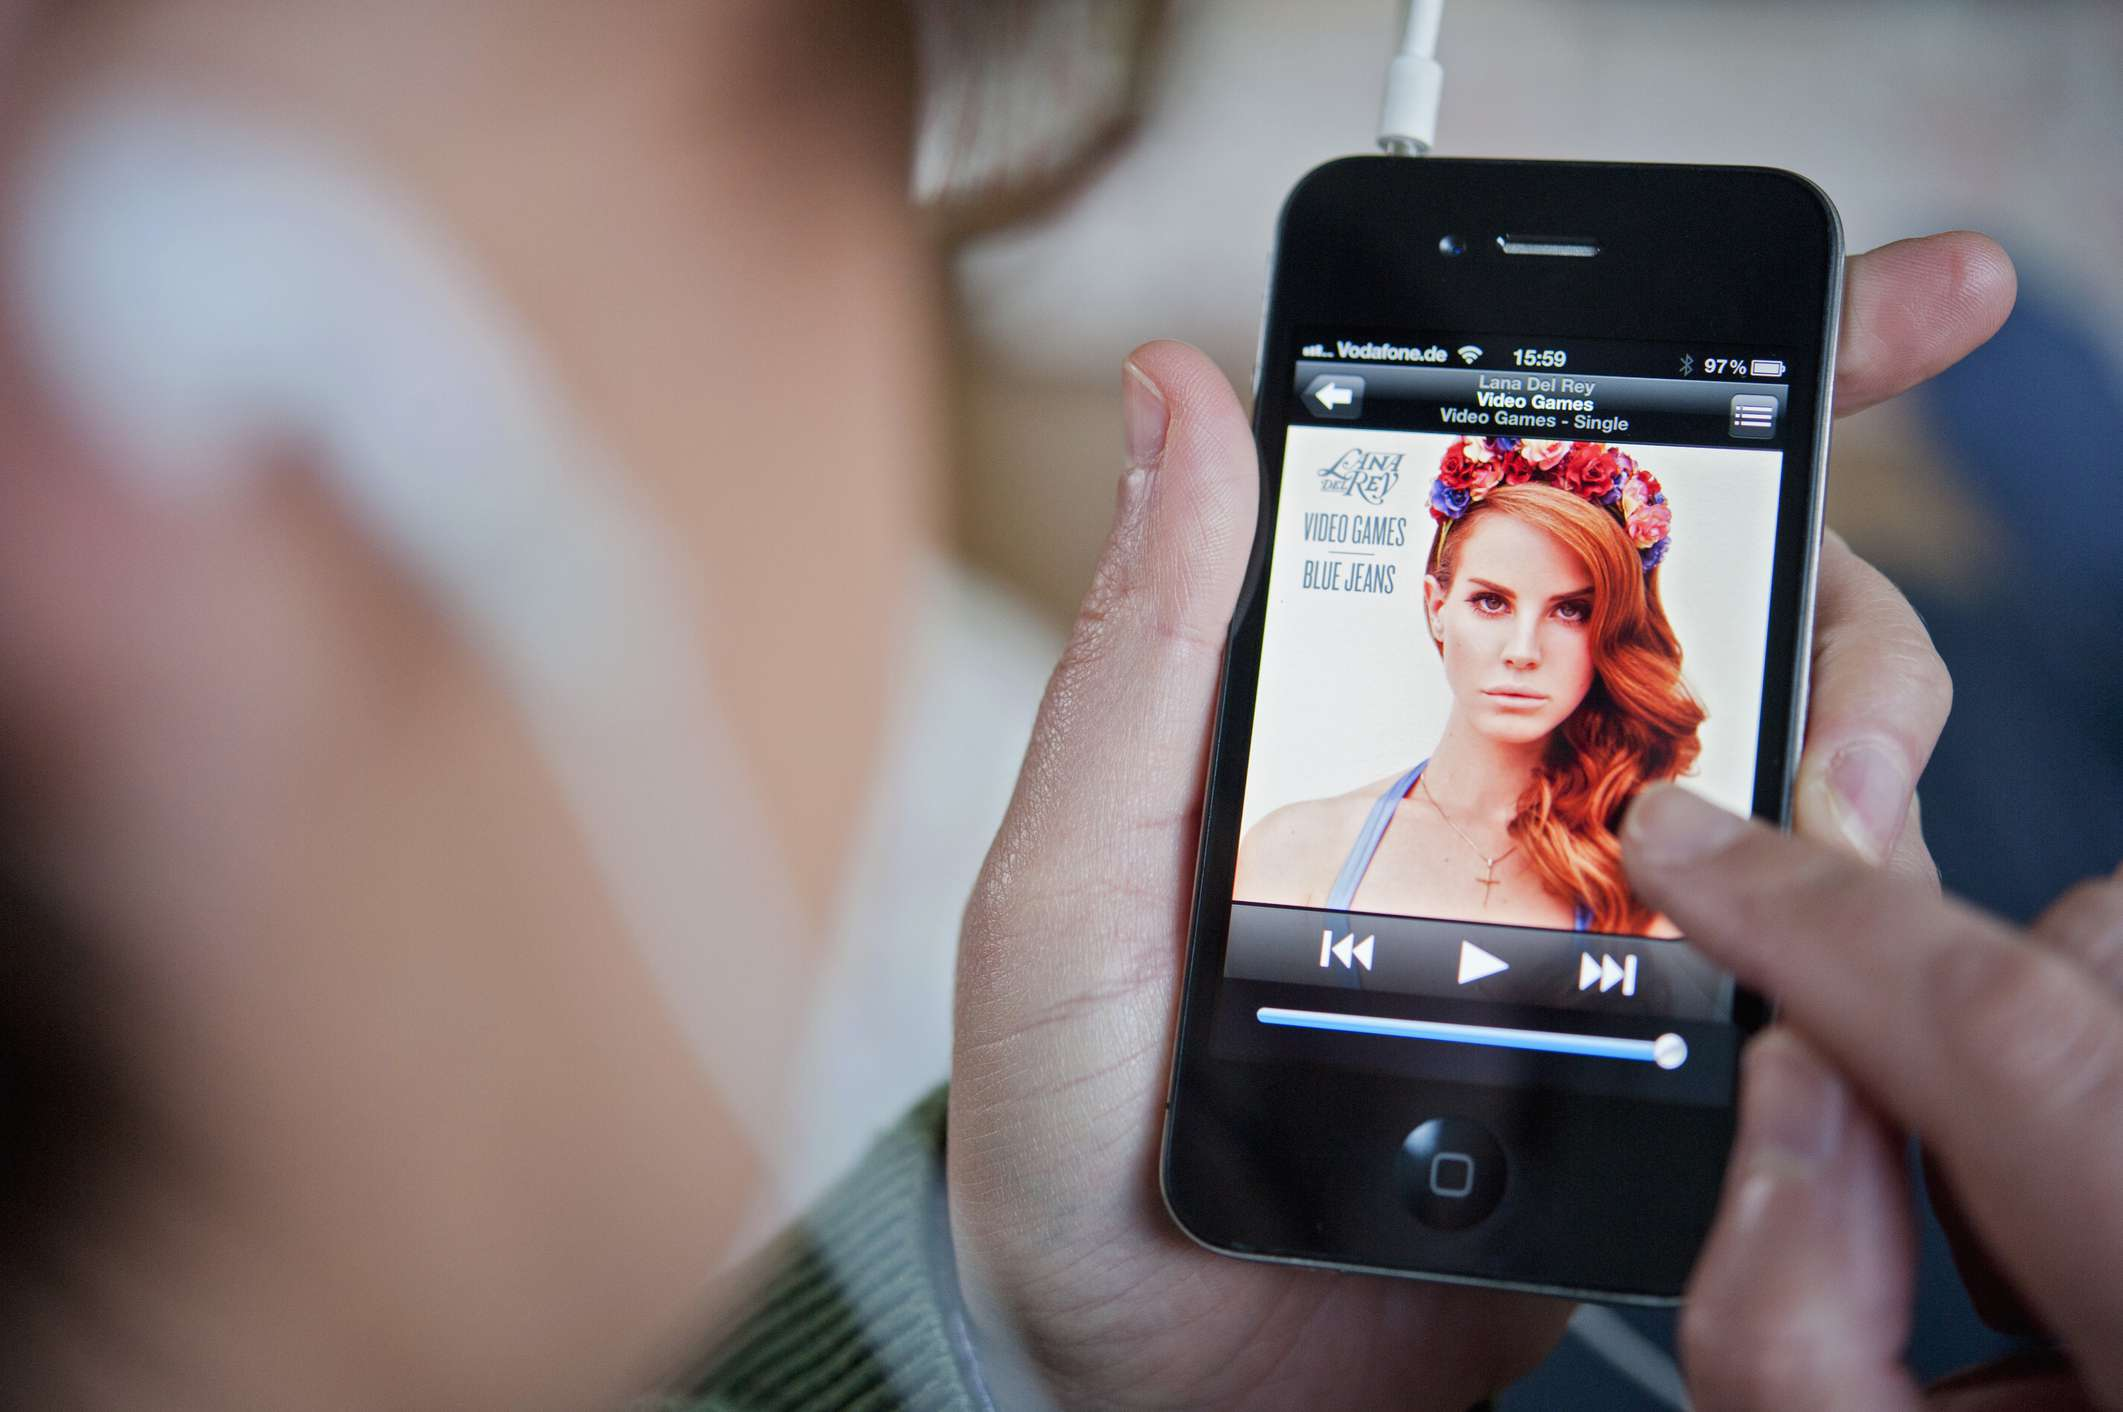 A closeup of an iPhone playing music.